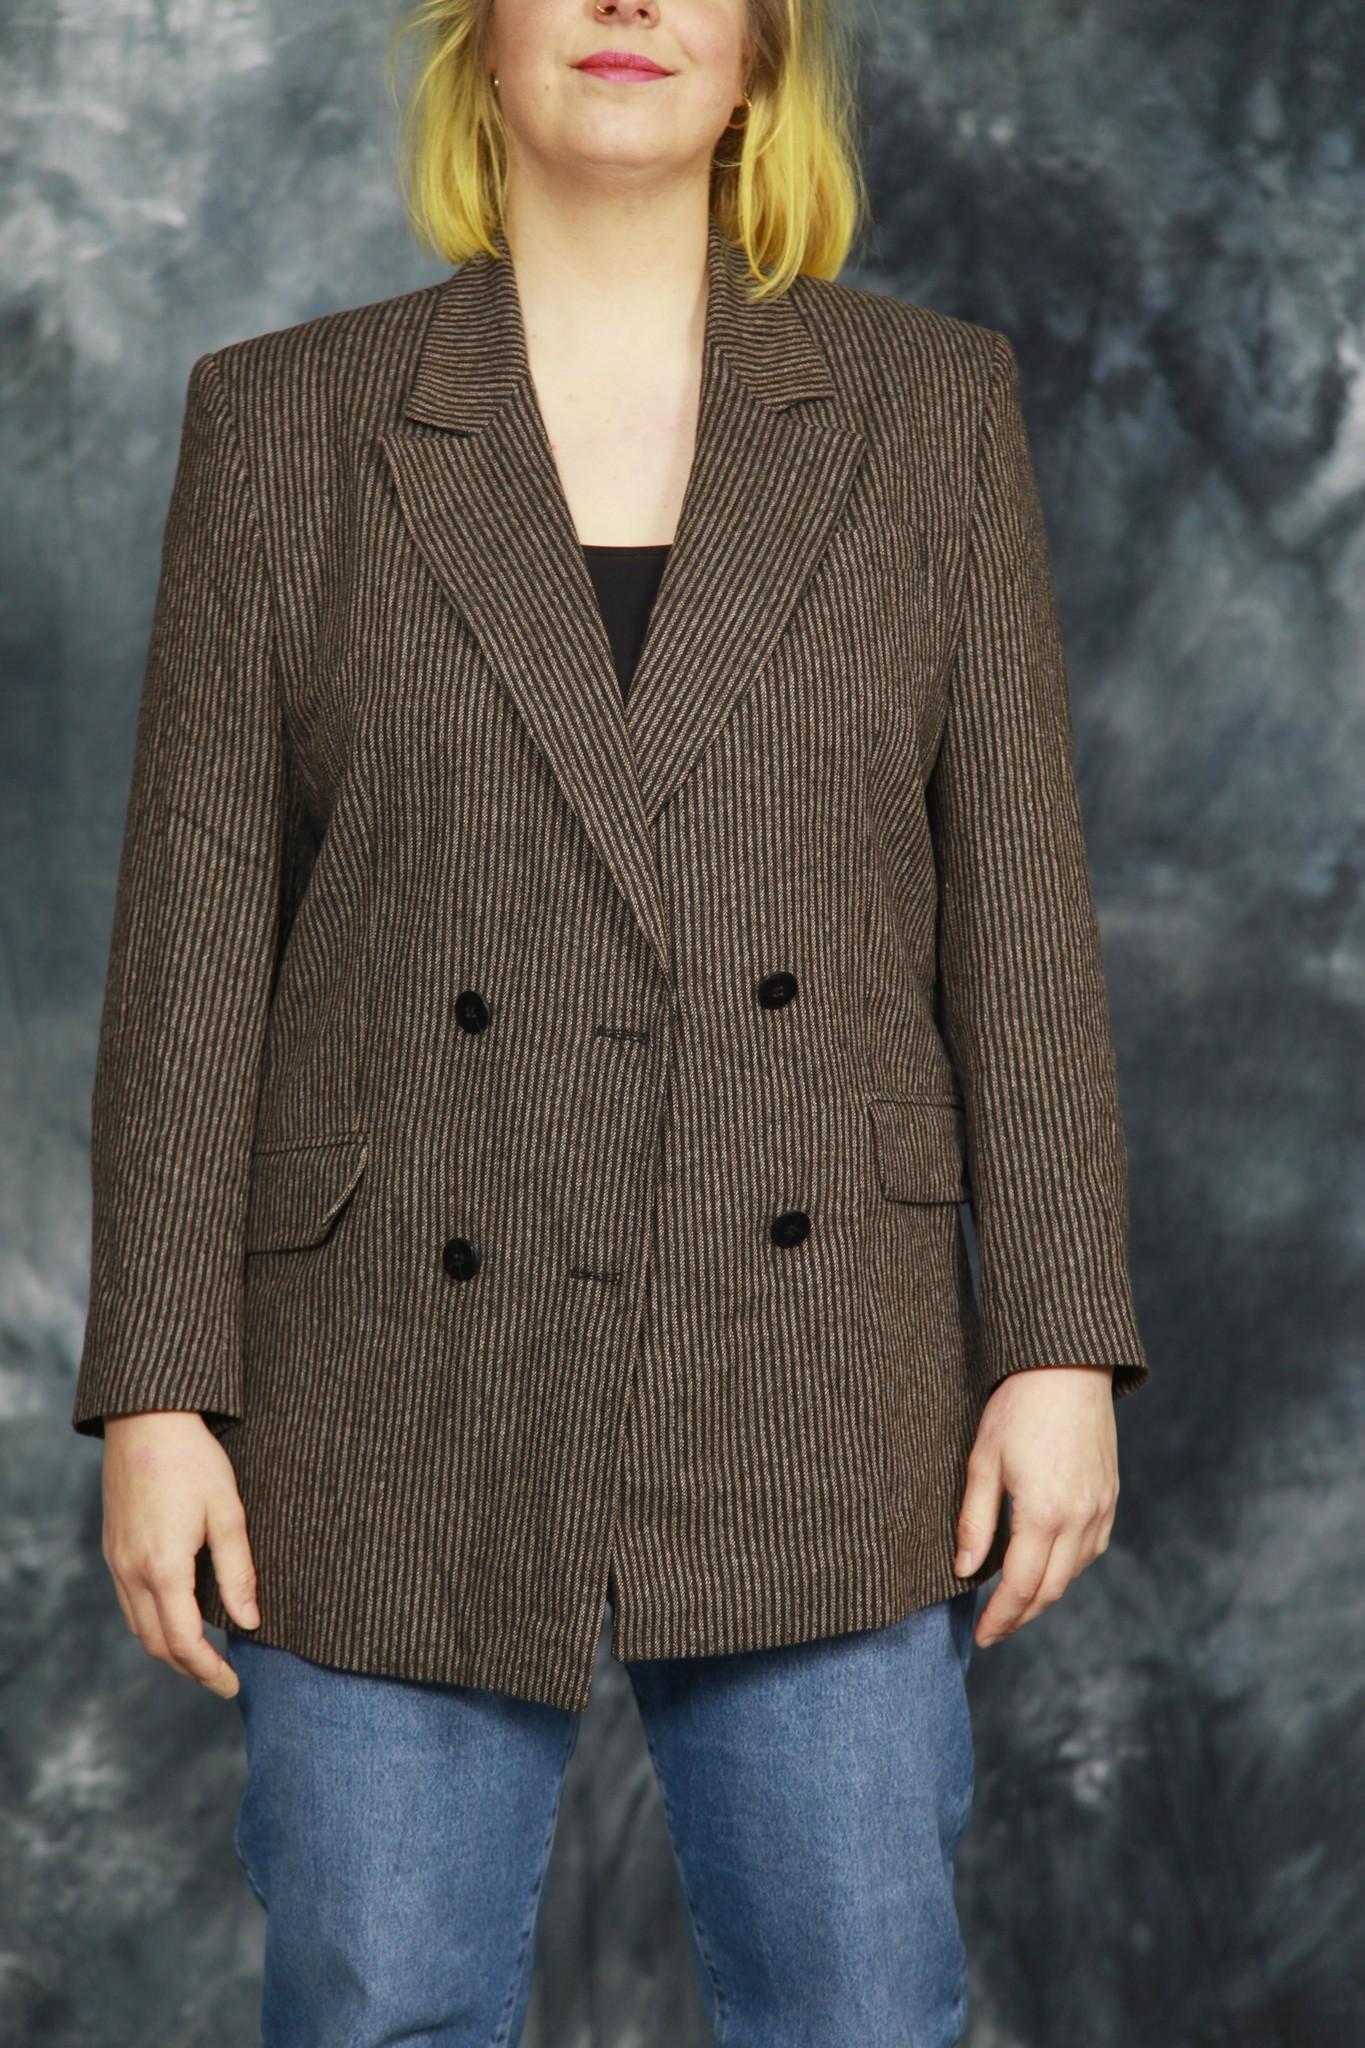 Beautiful brown jacket